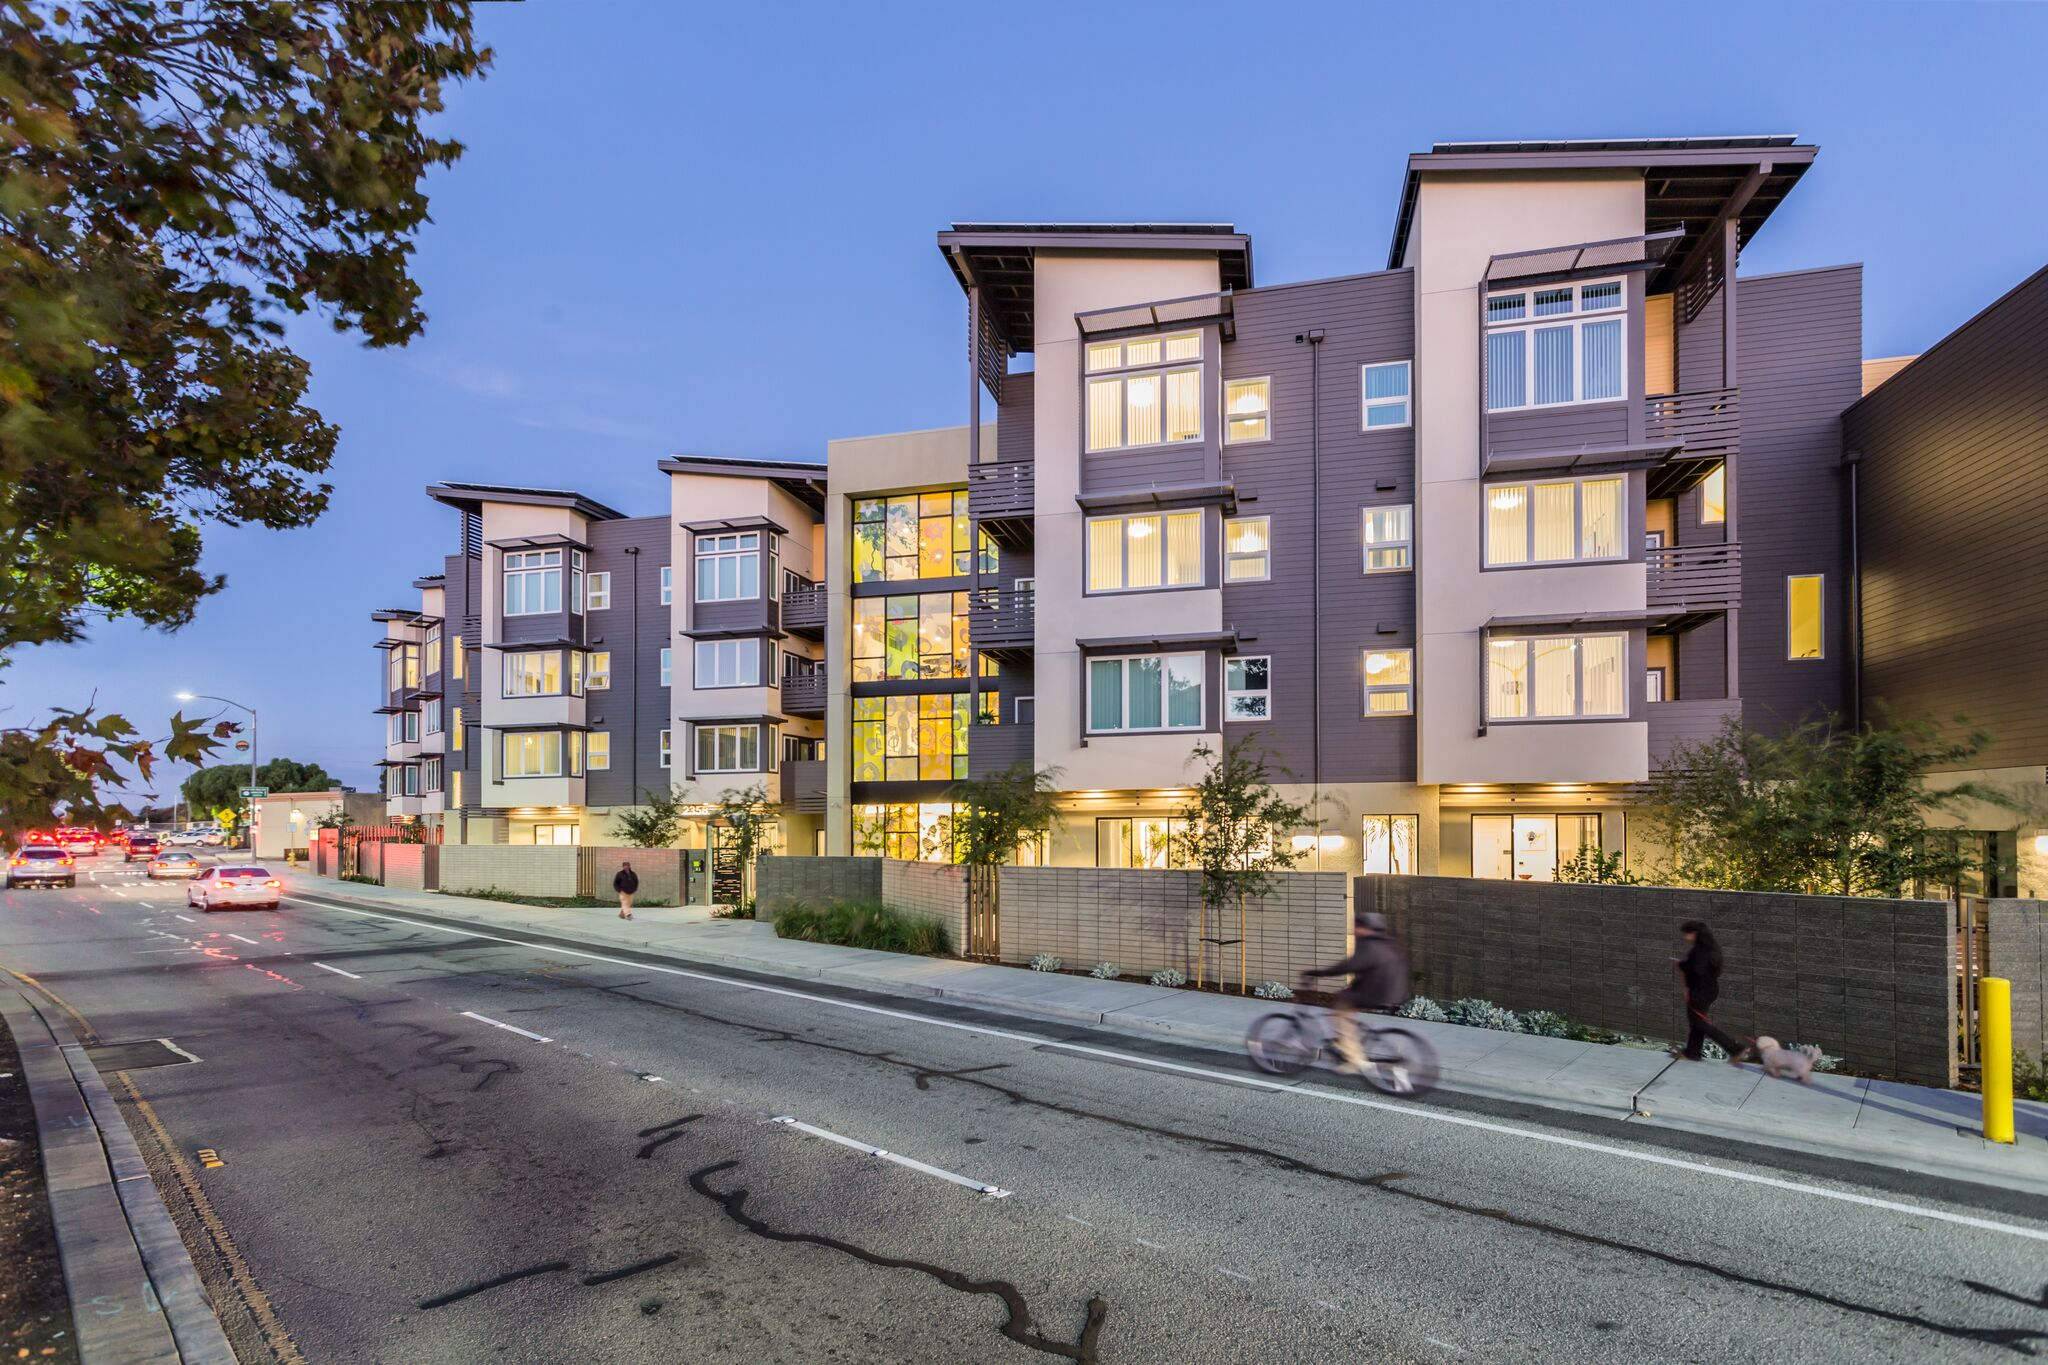 Serenity Senior Housing, East Palo Alto